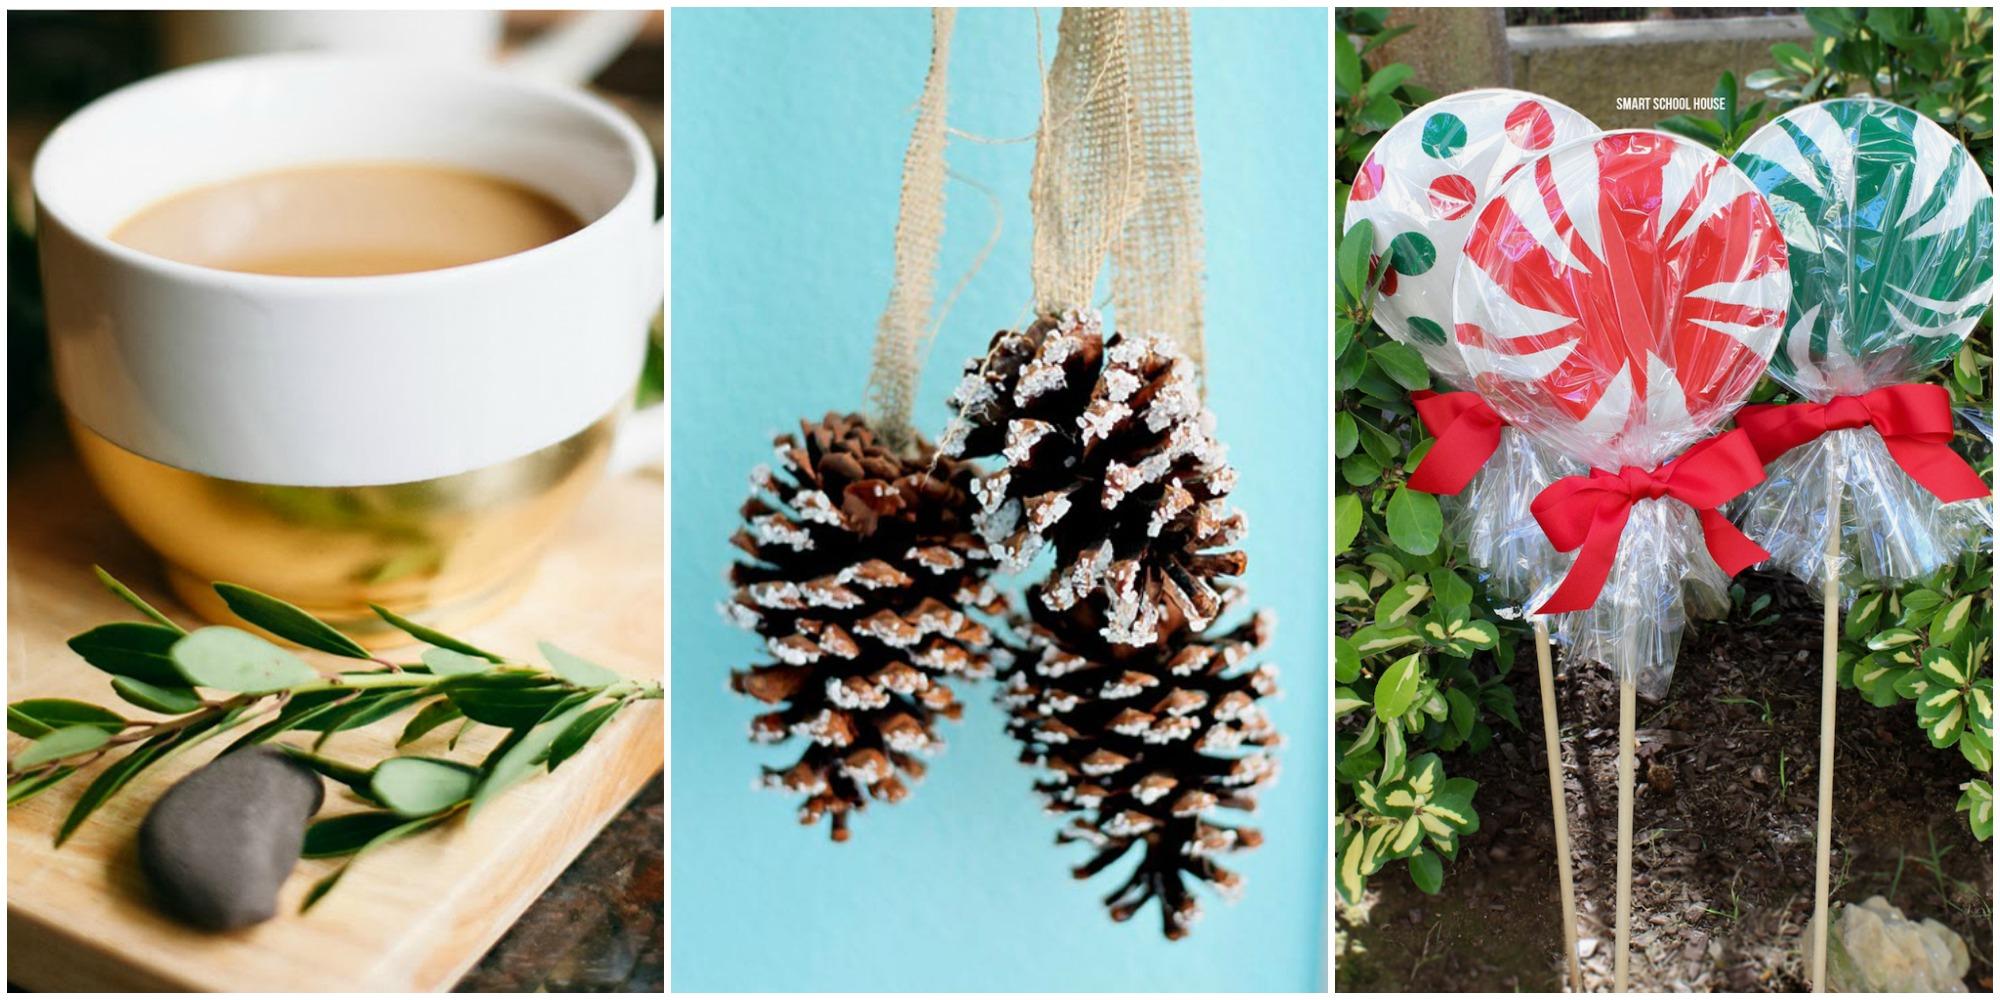 51 trash to treasure christmas crafts diy holiday decorations. Black Bedroom Furniture Sets. Home Design Ideas